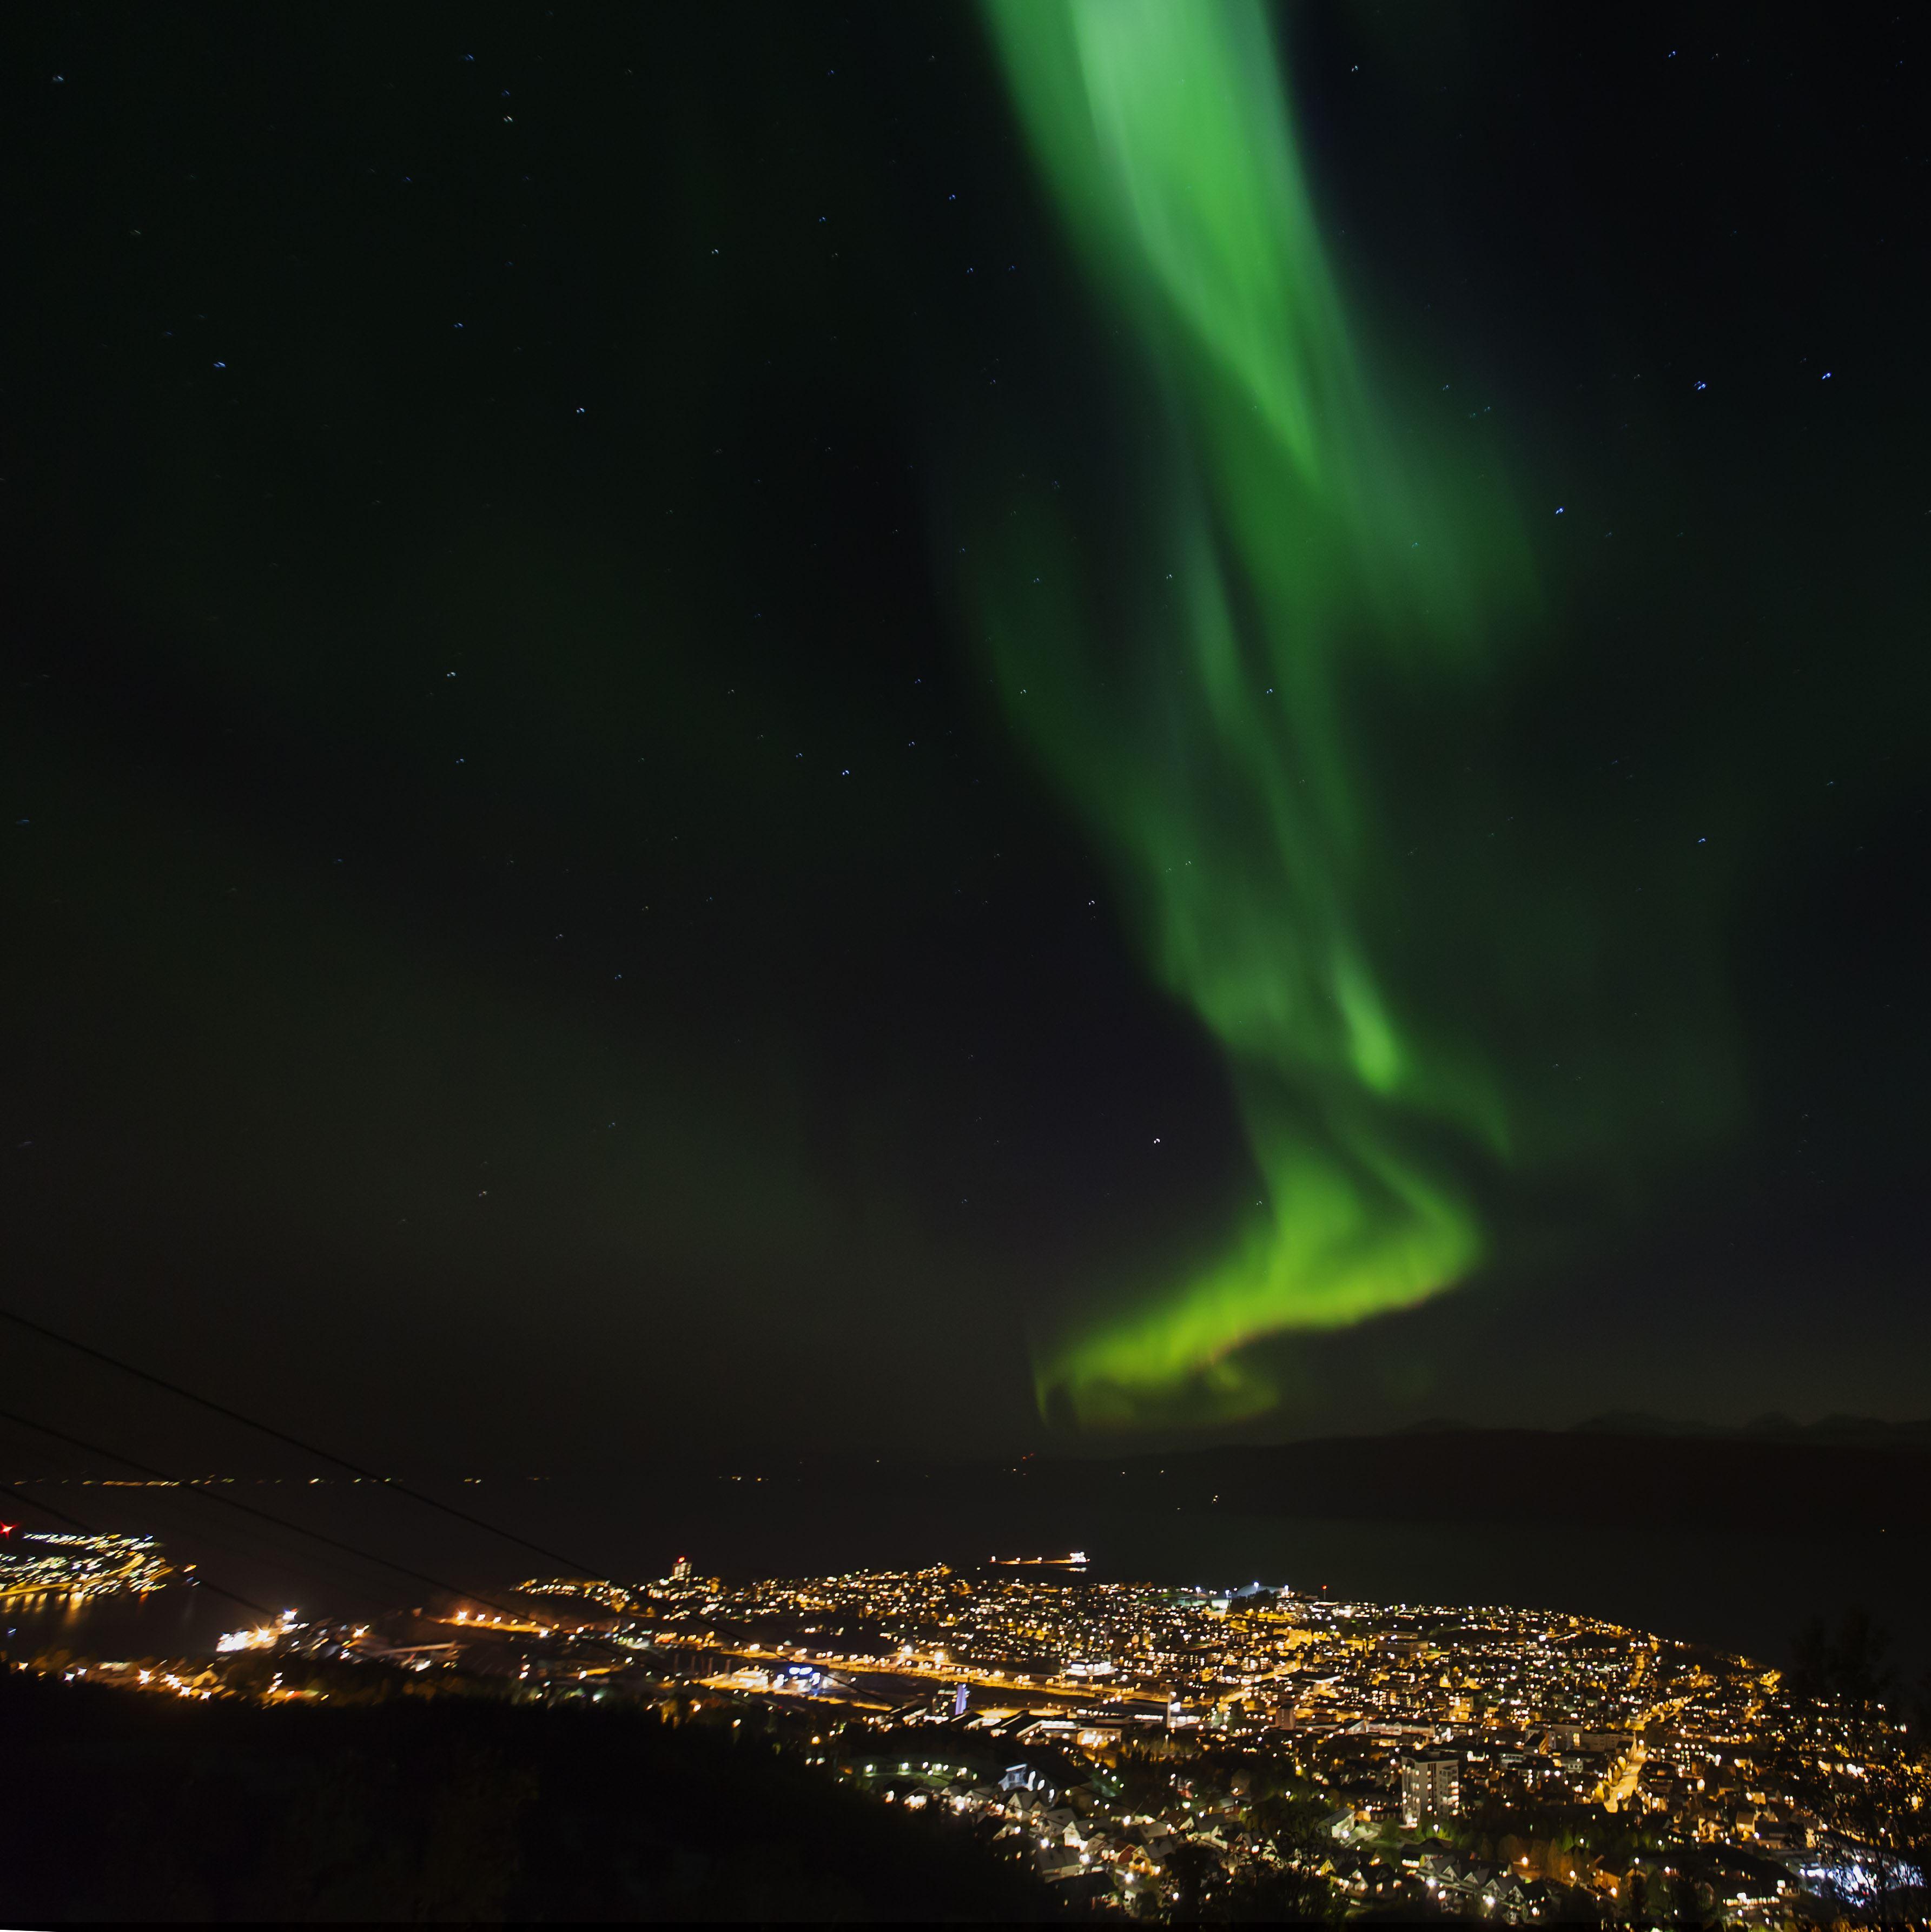 Jan Arne Pettersen,  © Jan Arne Pettersen, Nordlysjakt i den Arktiske Narvik Regionen